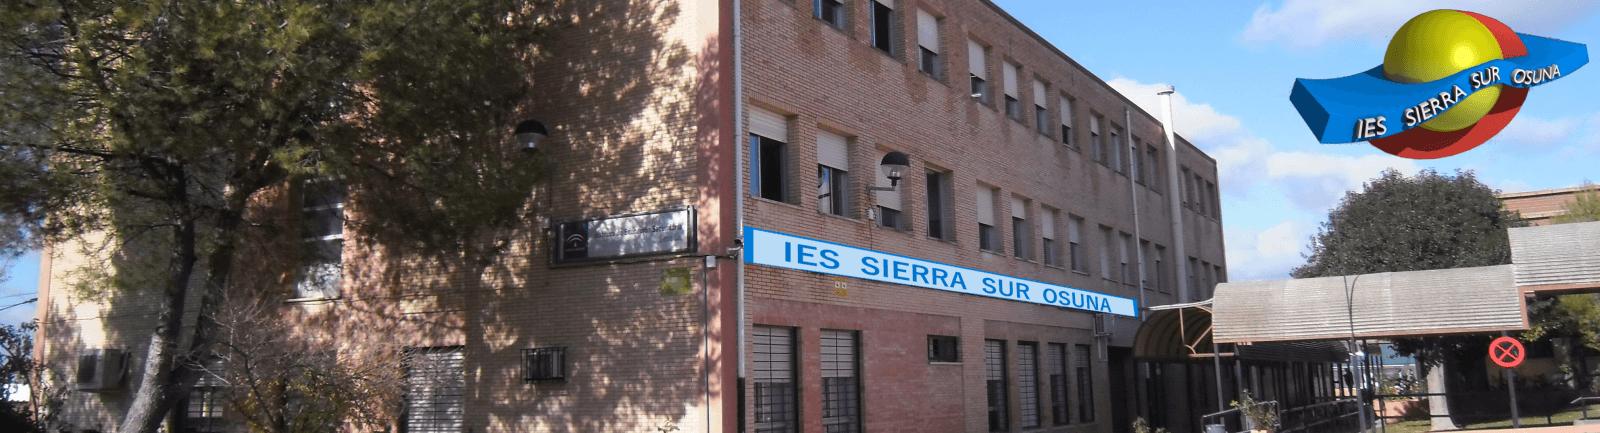 IES Sierra Sur - Osuna